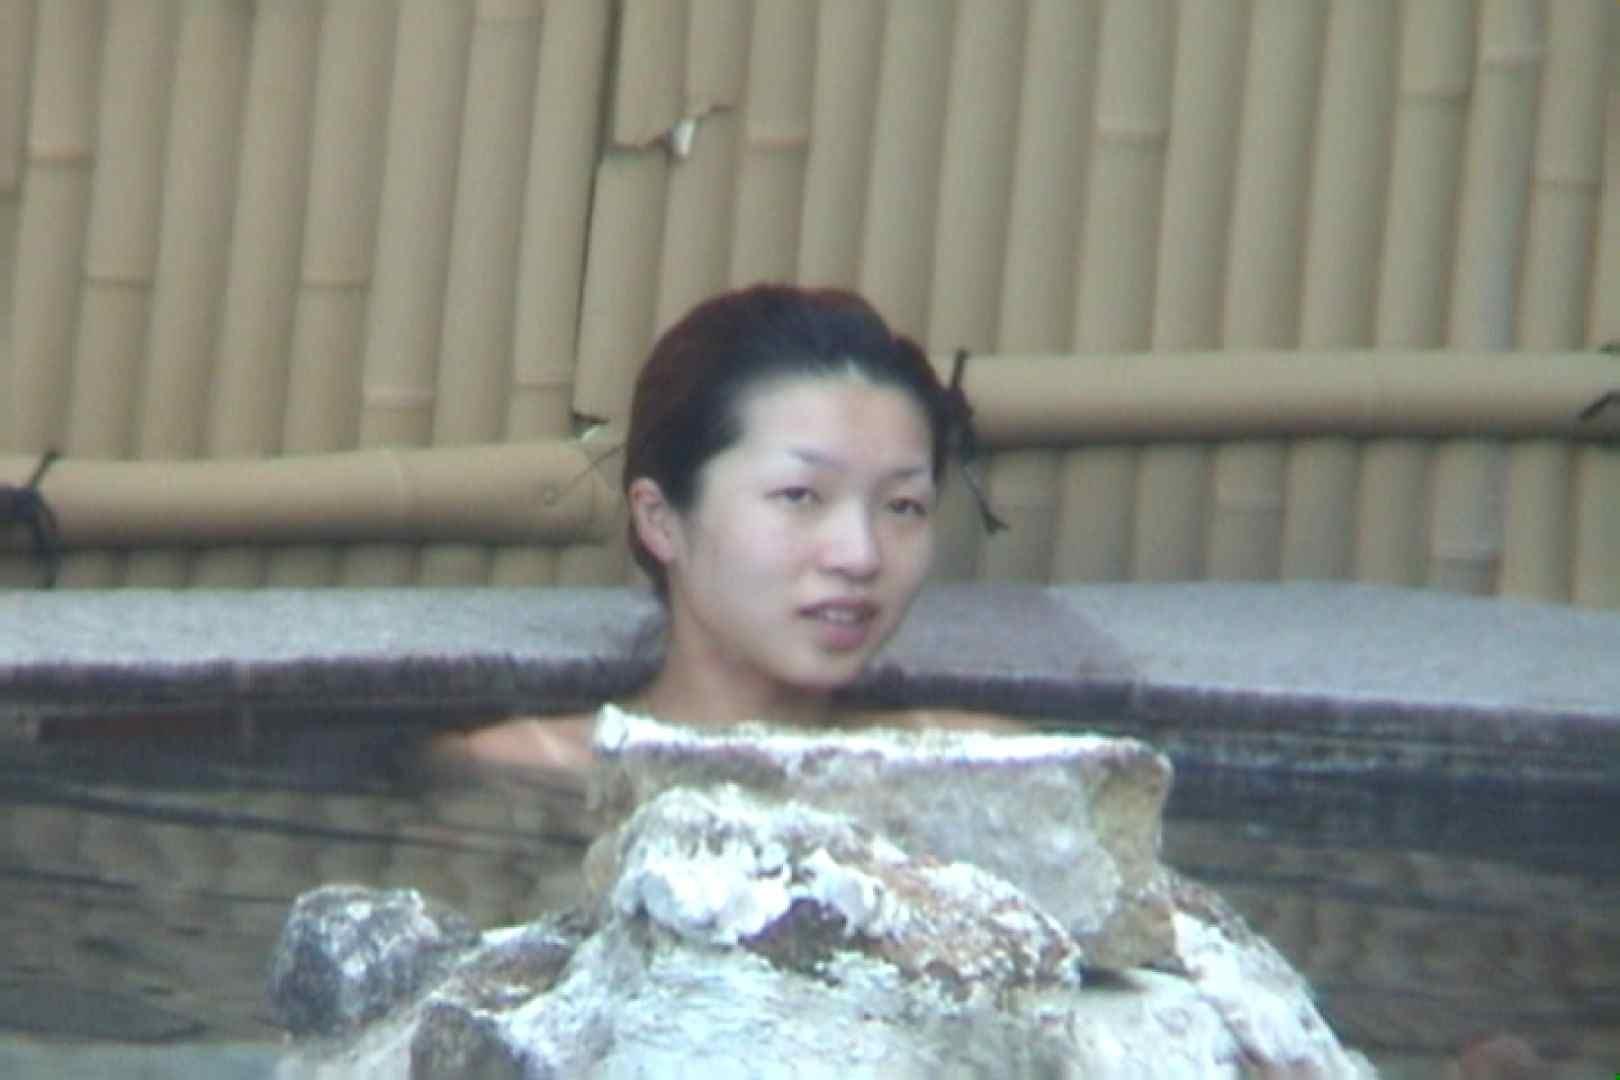 Aquaな露天風呂Vol.571 盗撮 | OLセックス  83画像 1